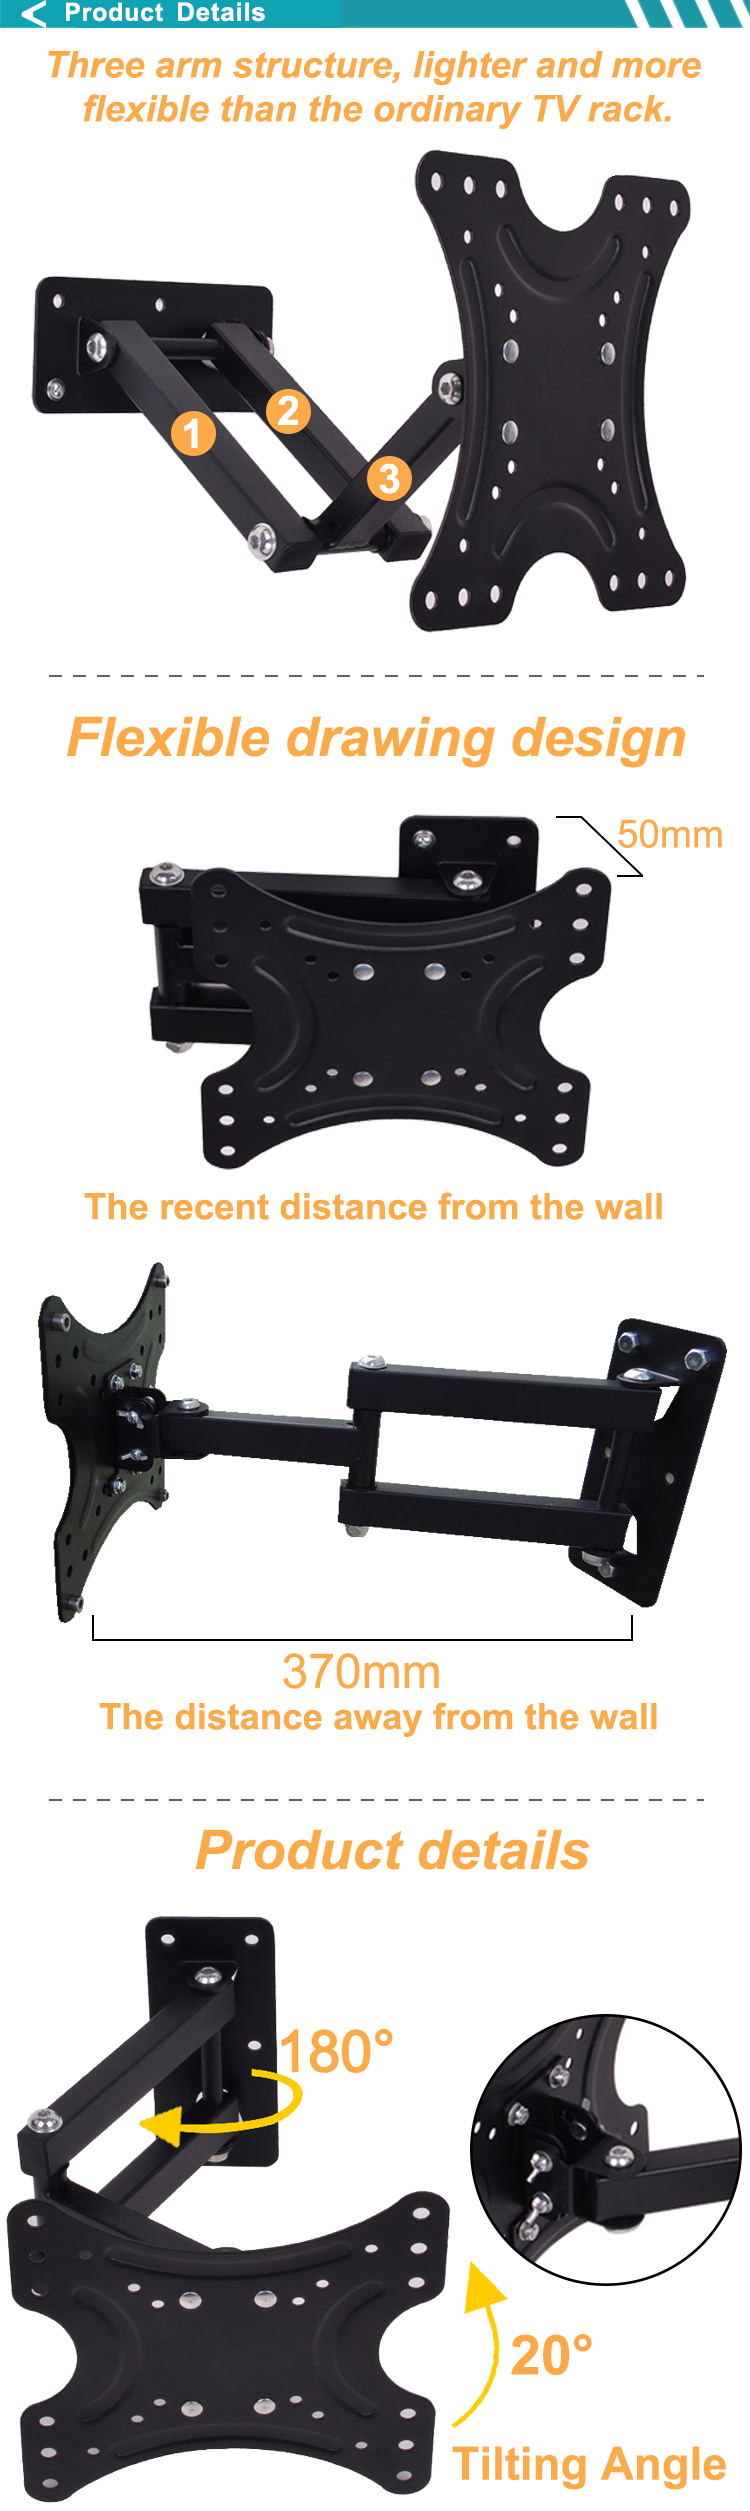 Telescoping Tv Arm : Degree telescoping swing arm wall mount tv holder for